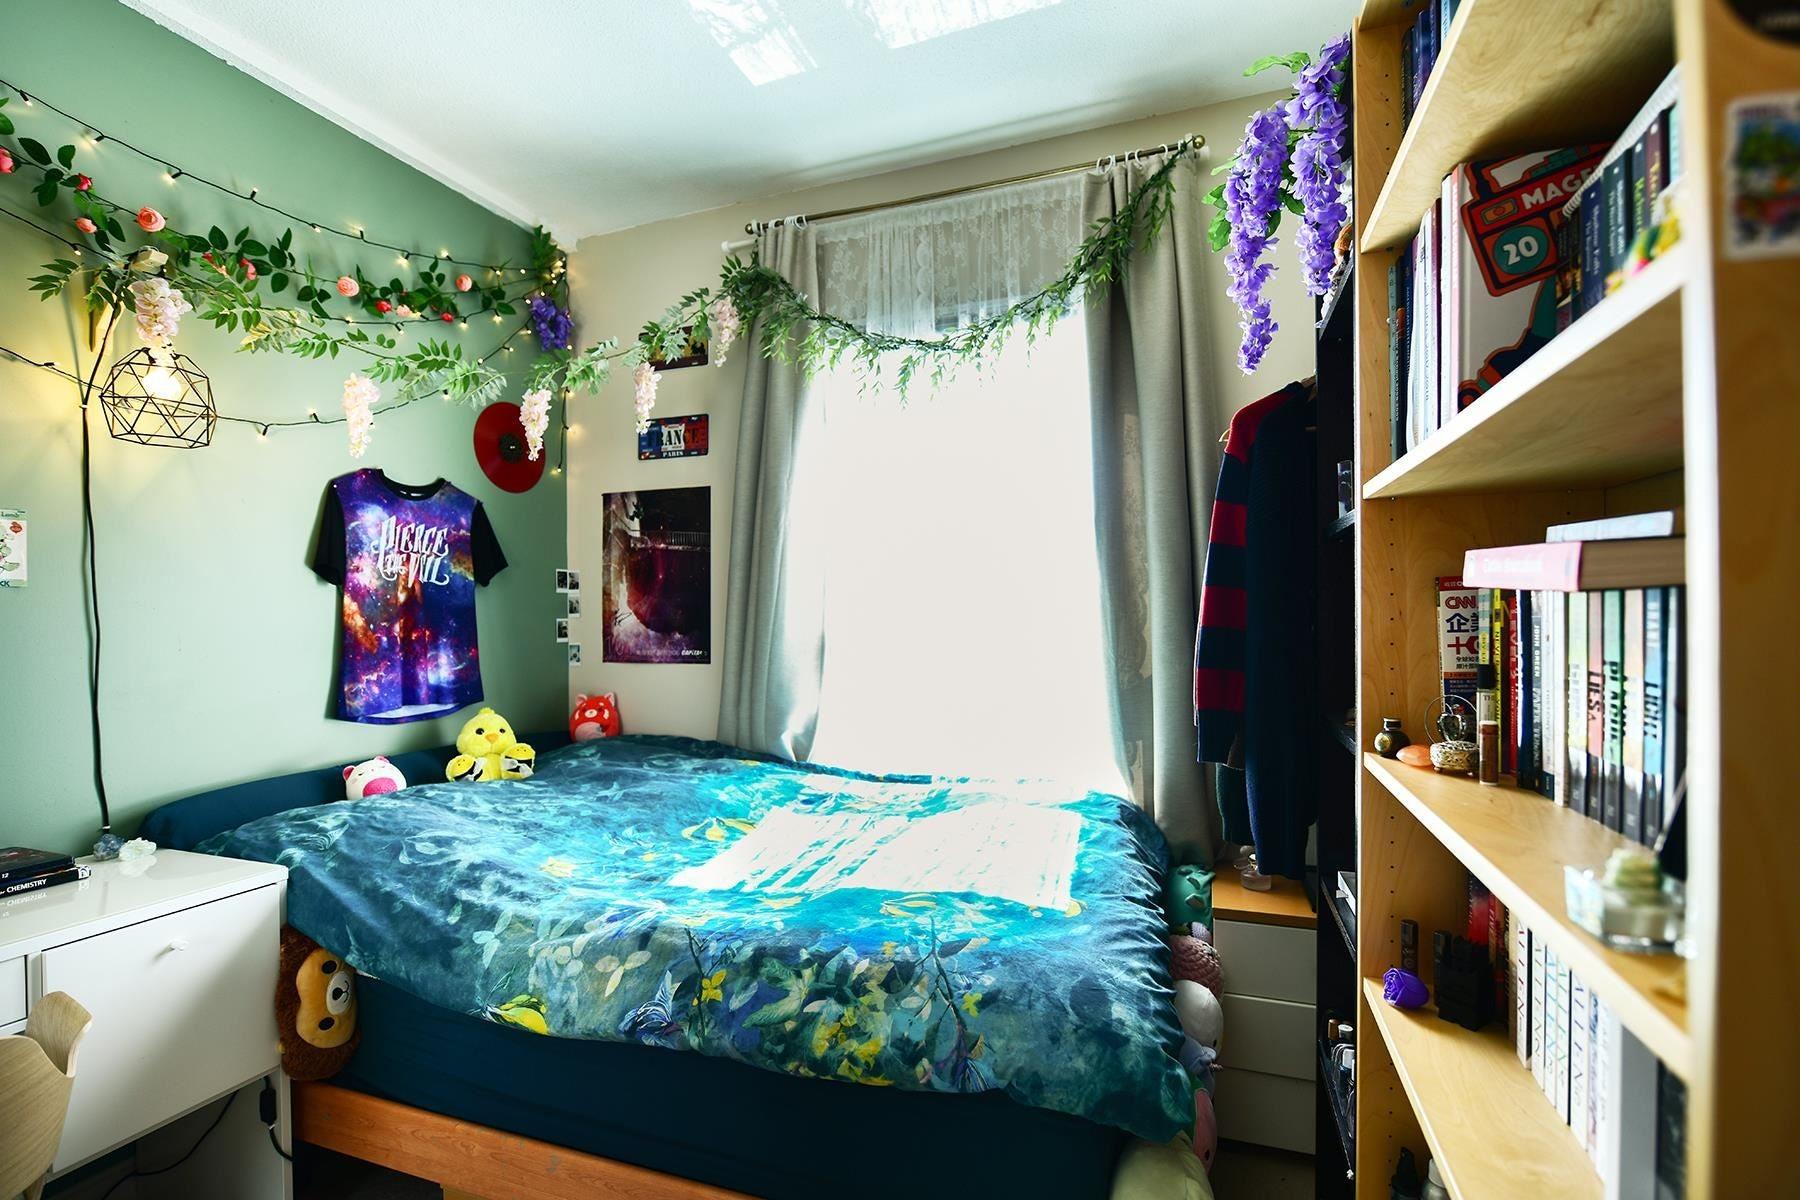 204 5790 EAST BOULEVARD - Kerrisdale Apartment/Condo for sale, 3 Bedrooms (R2604138) - #19